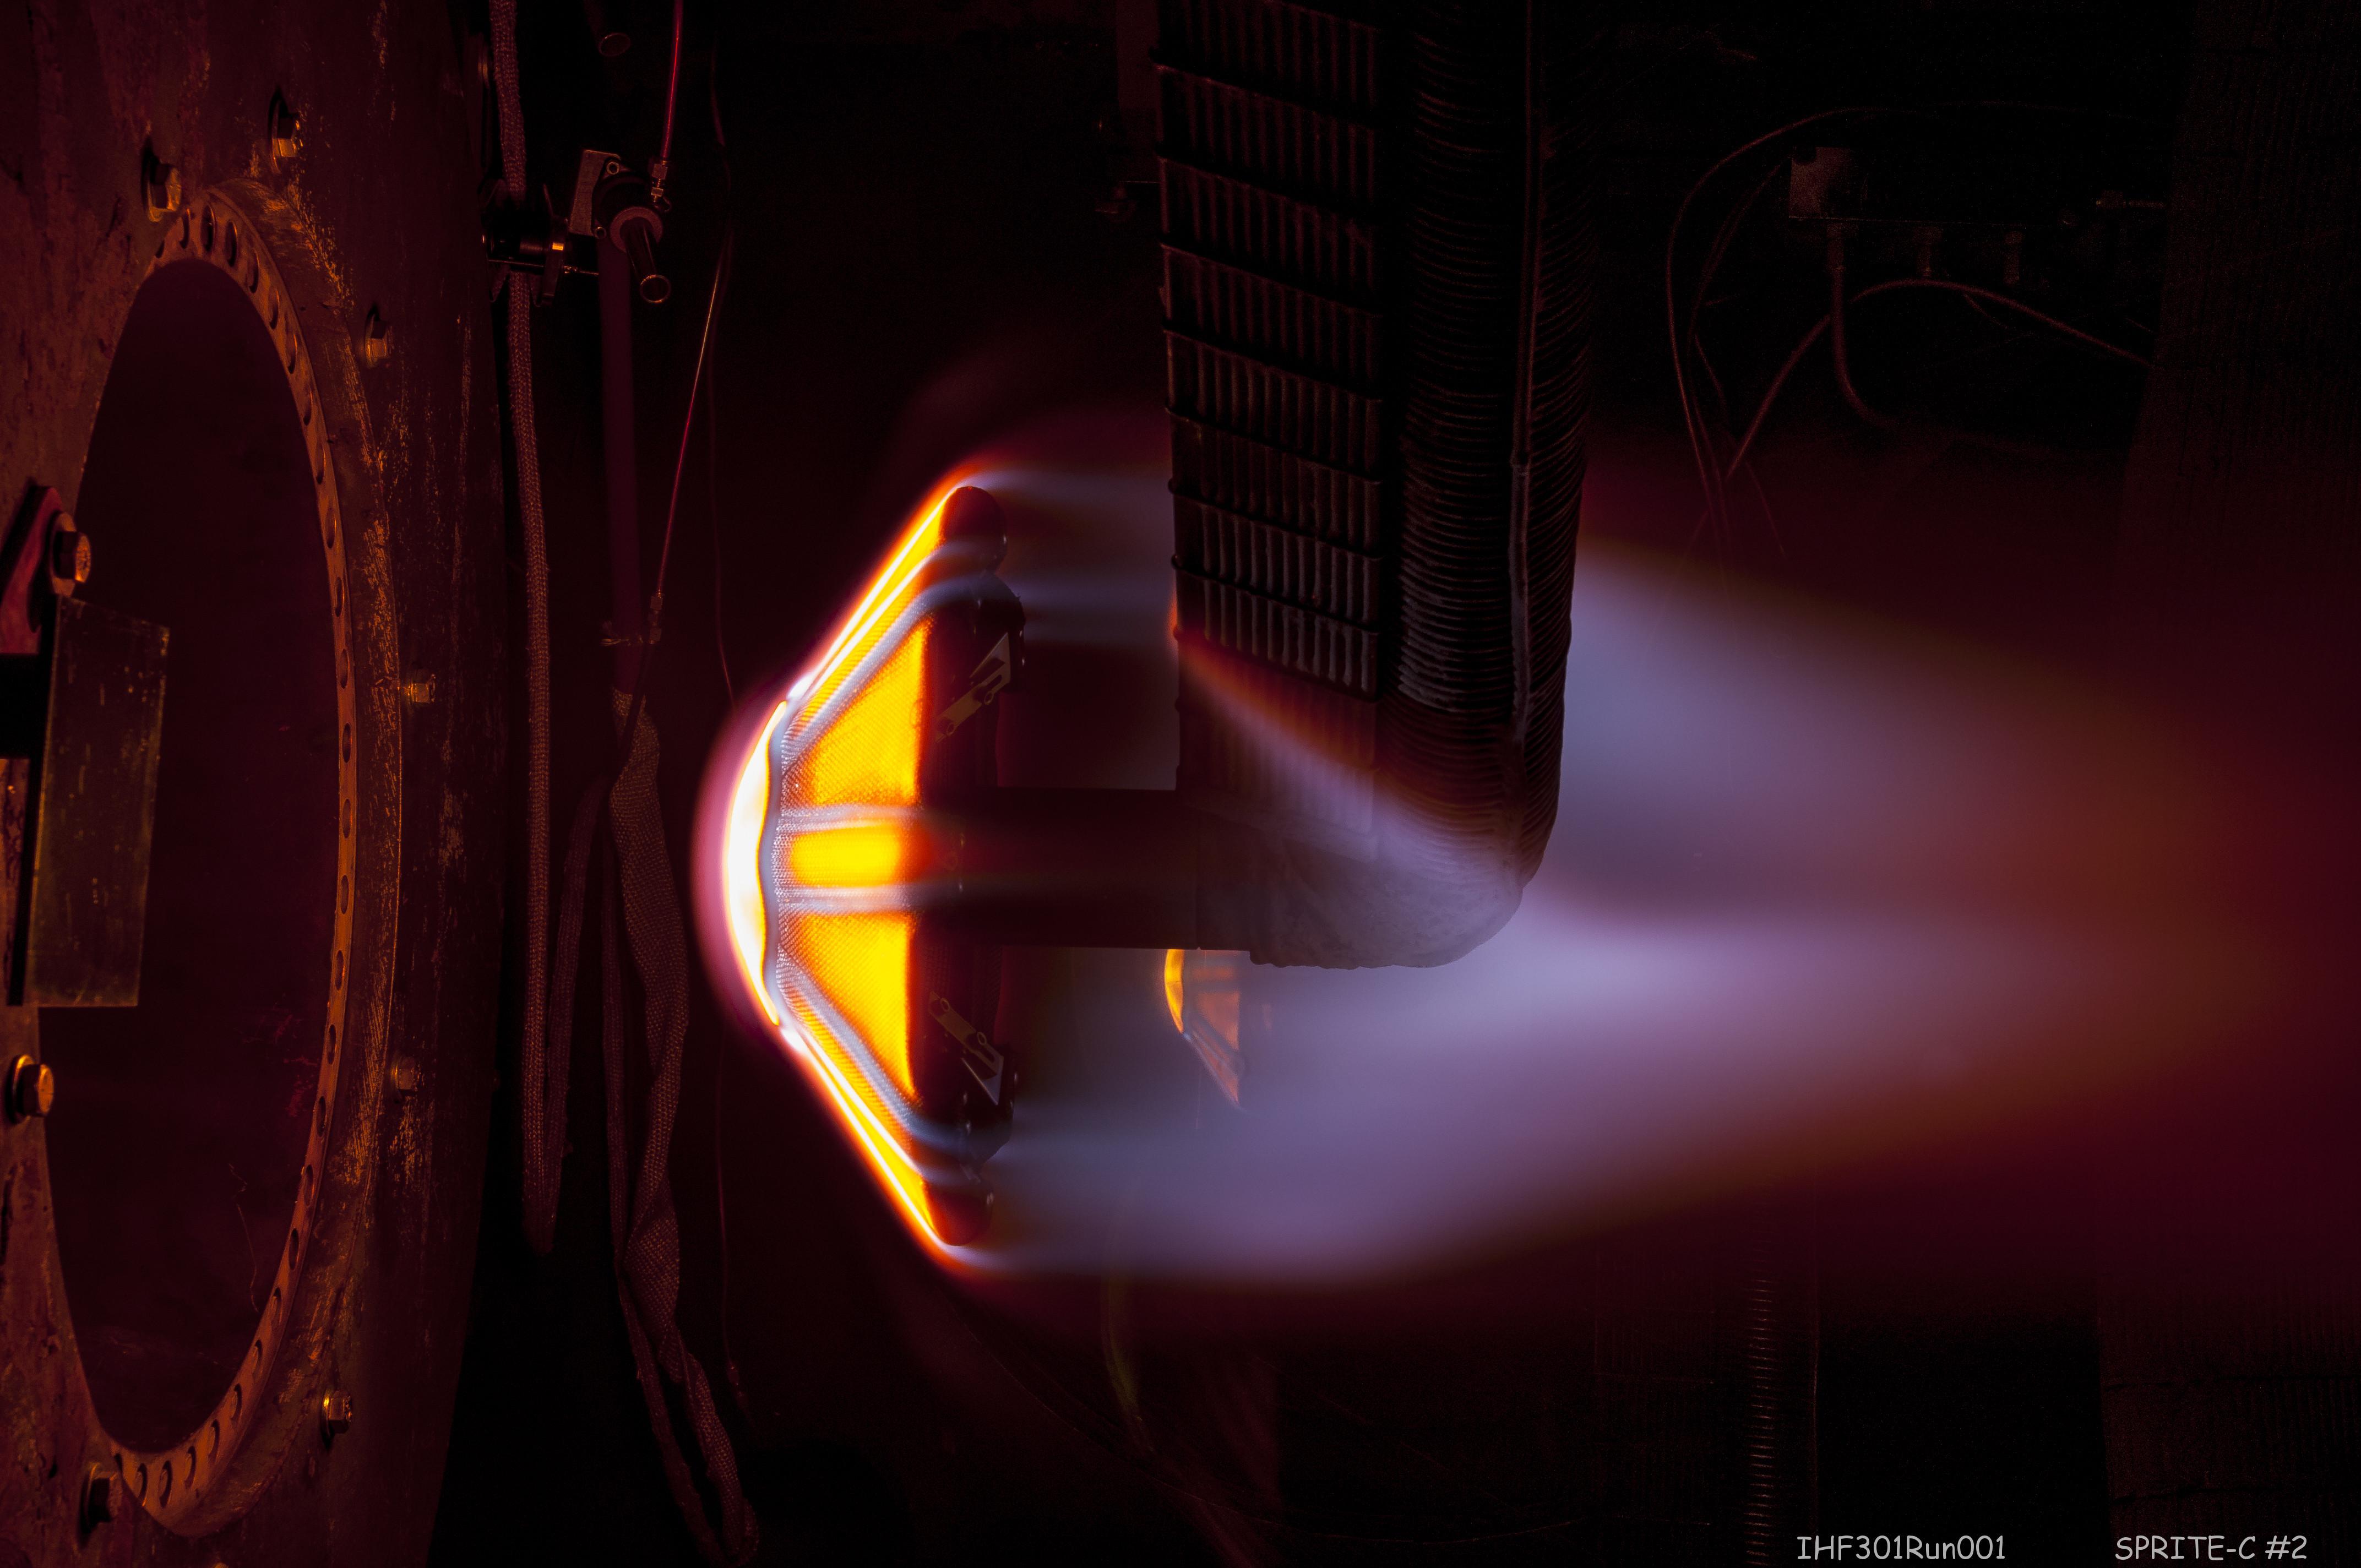 Successful Heat Shield Testing for Future Mars Exploration ...